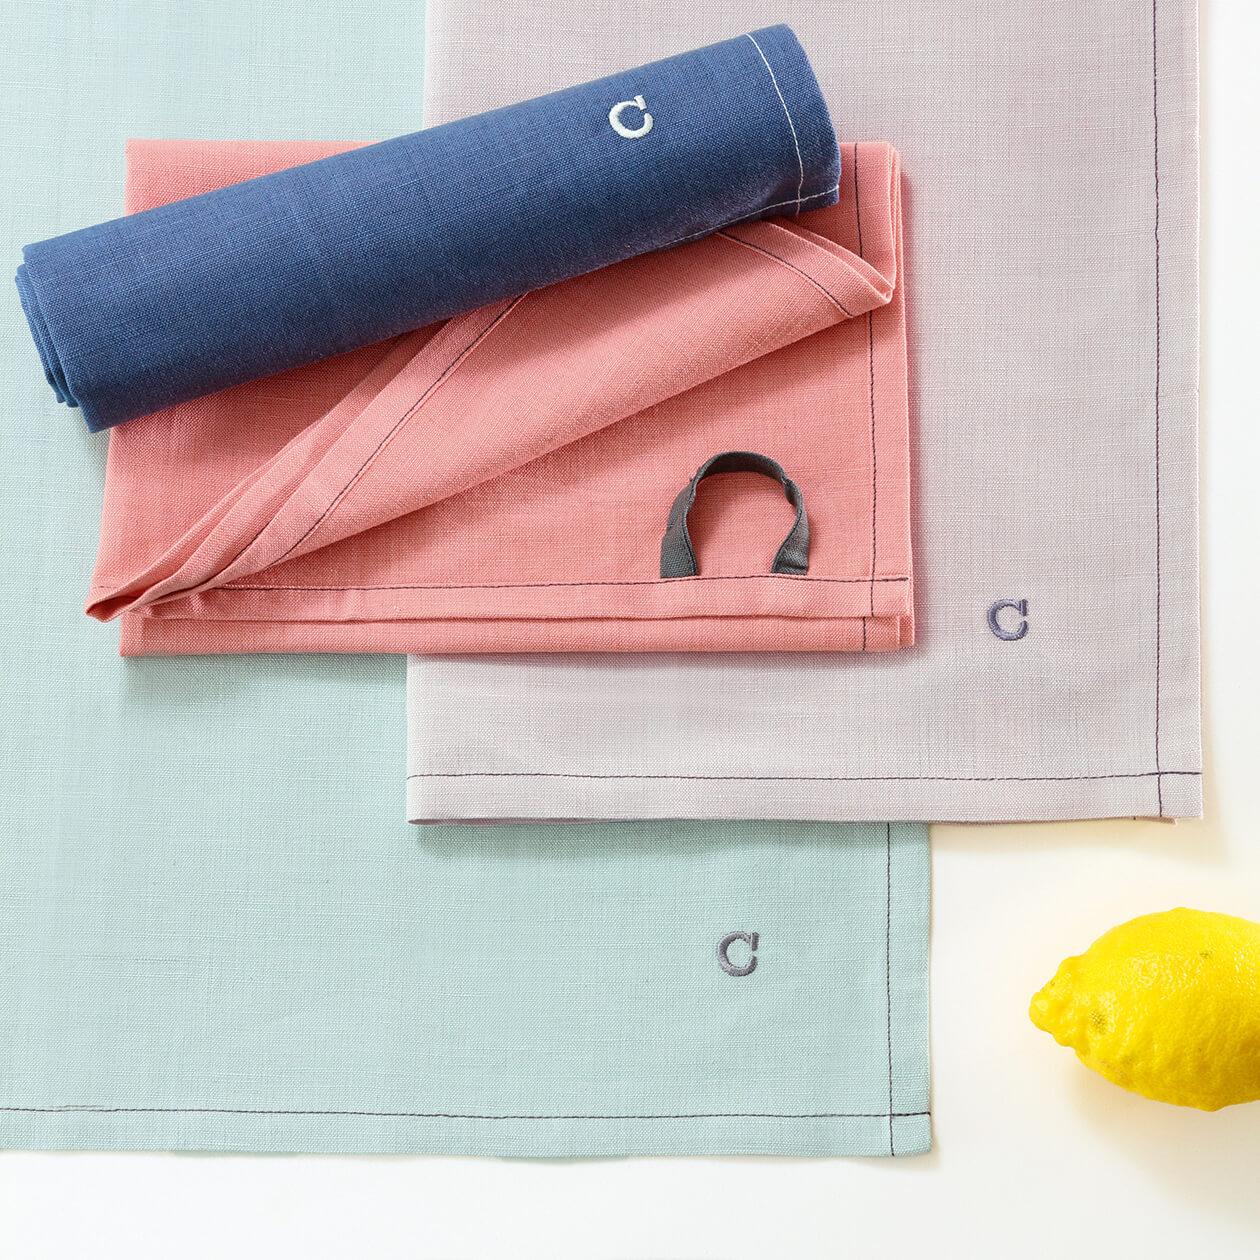 Cawö Home Solid 500 - Geschirrtuch 50x70 cm - Farbe: bordeaux - 280 Detailbild 3